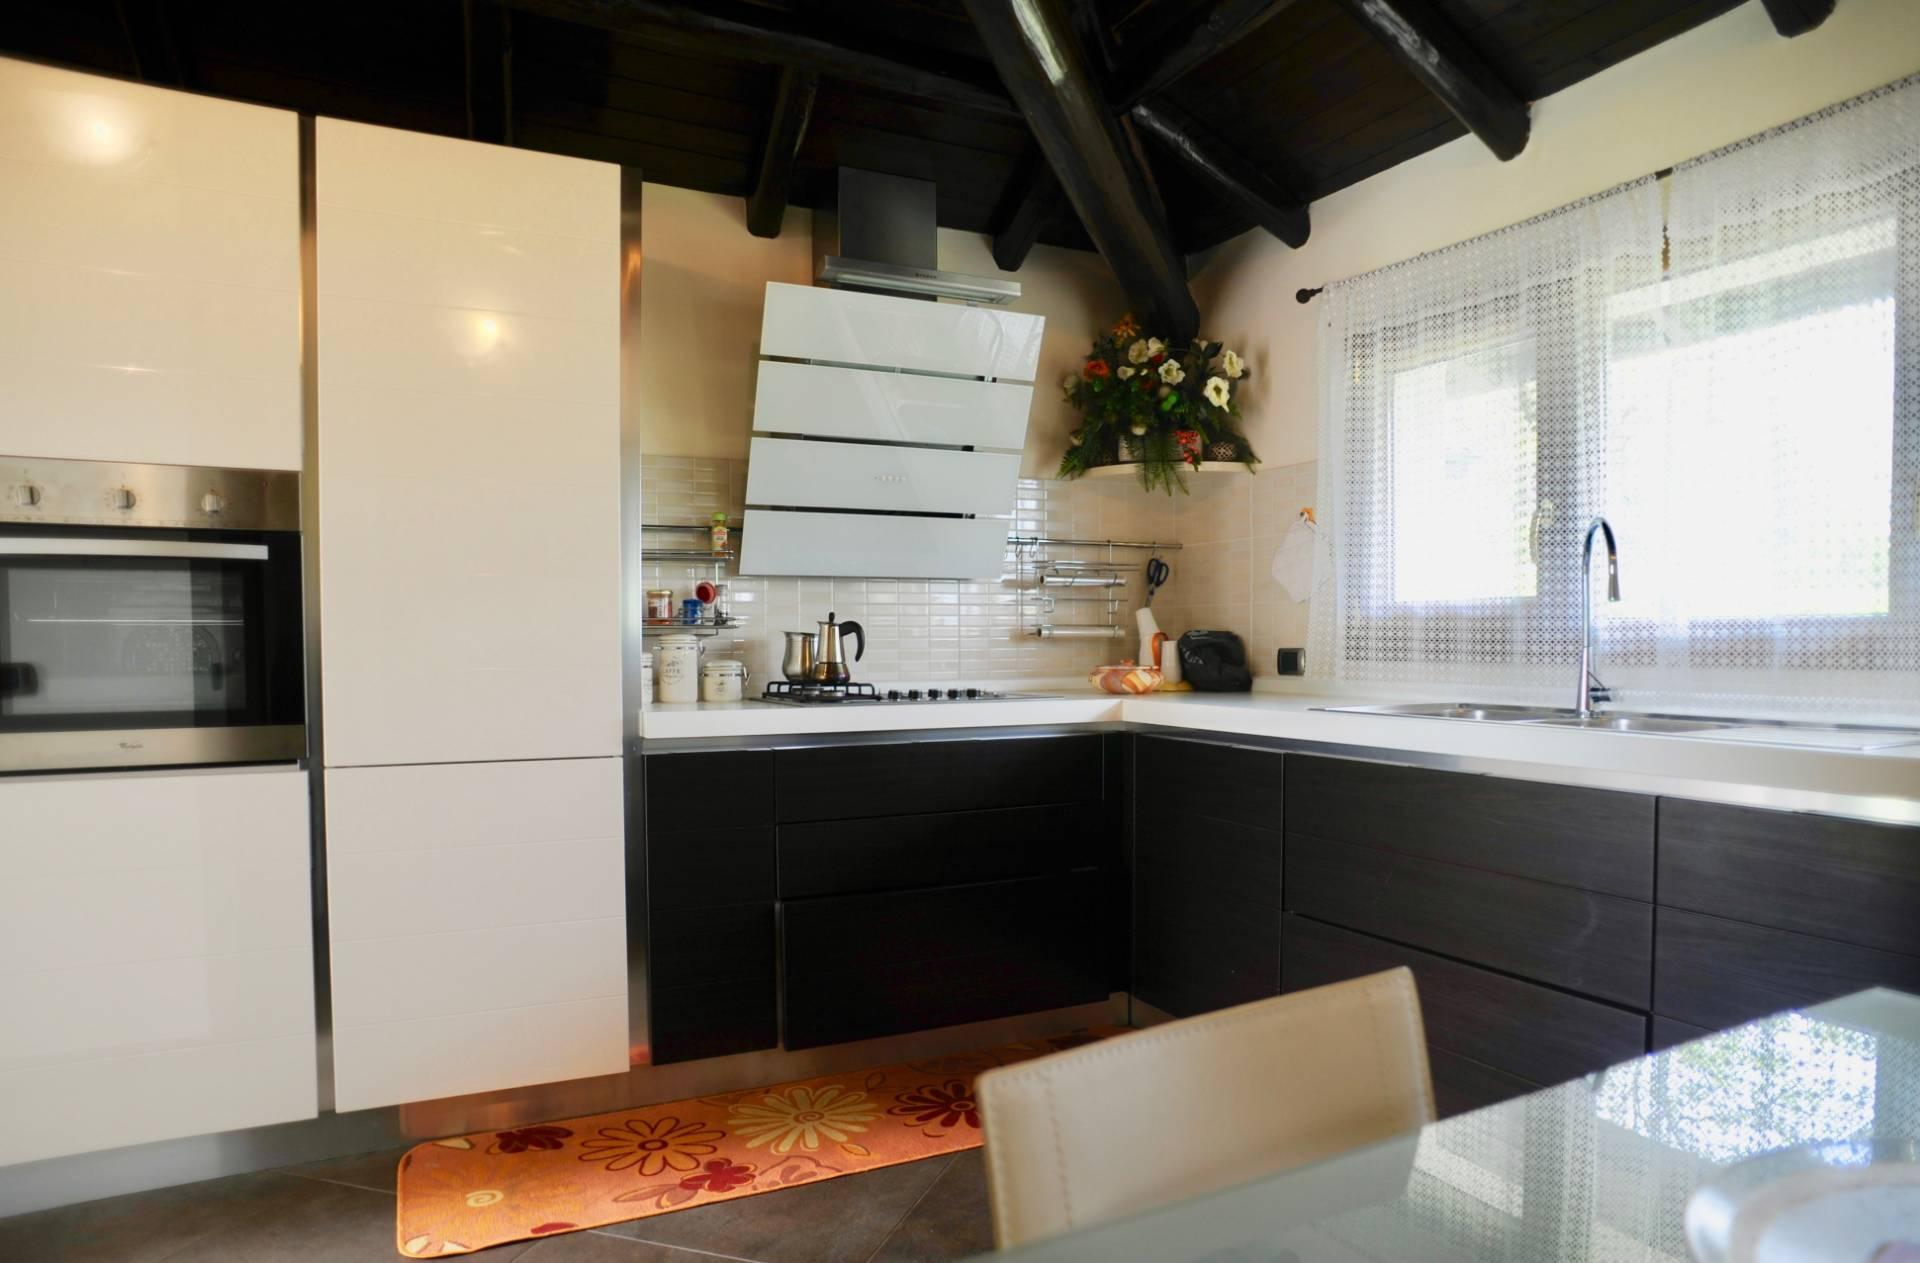 Villa in Vendita a Padenghe Sul Garda: 3 locali, 100 mq - Foto 8